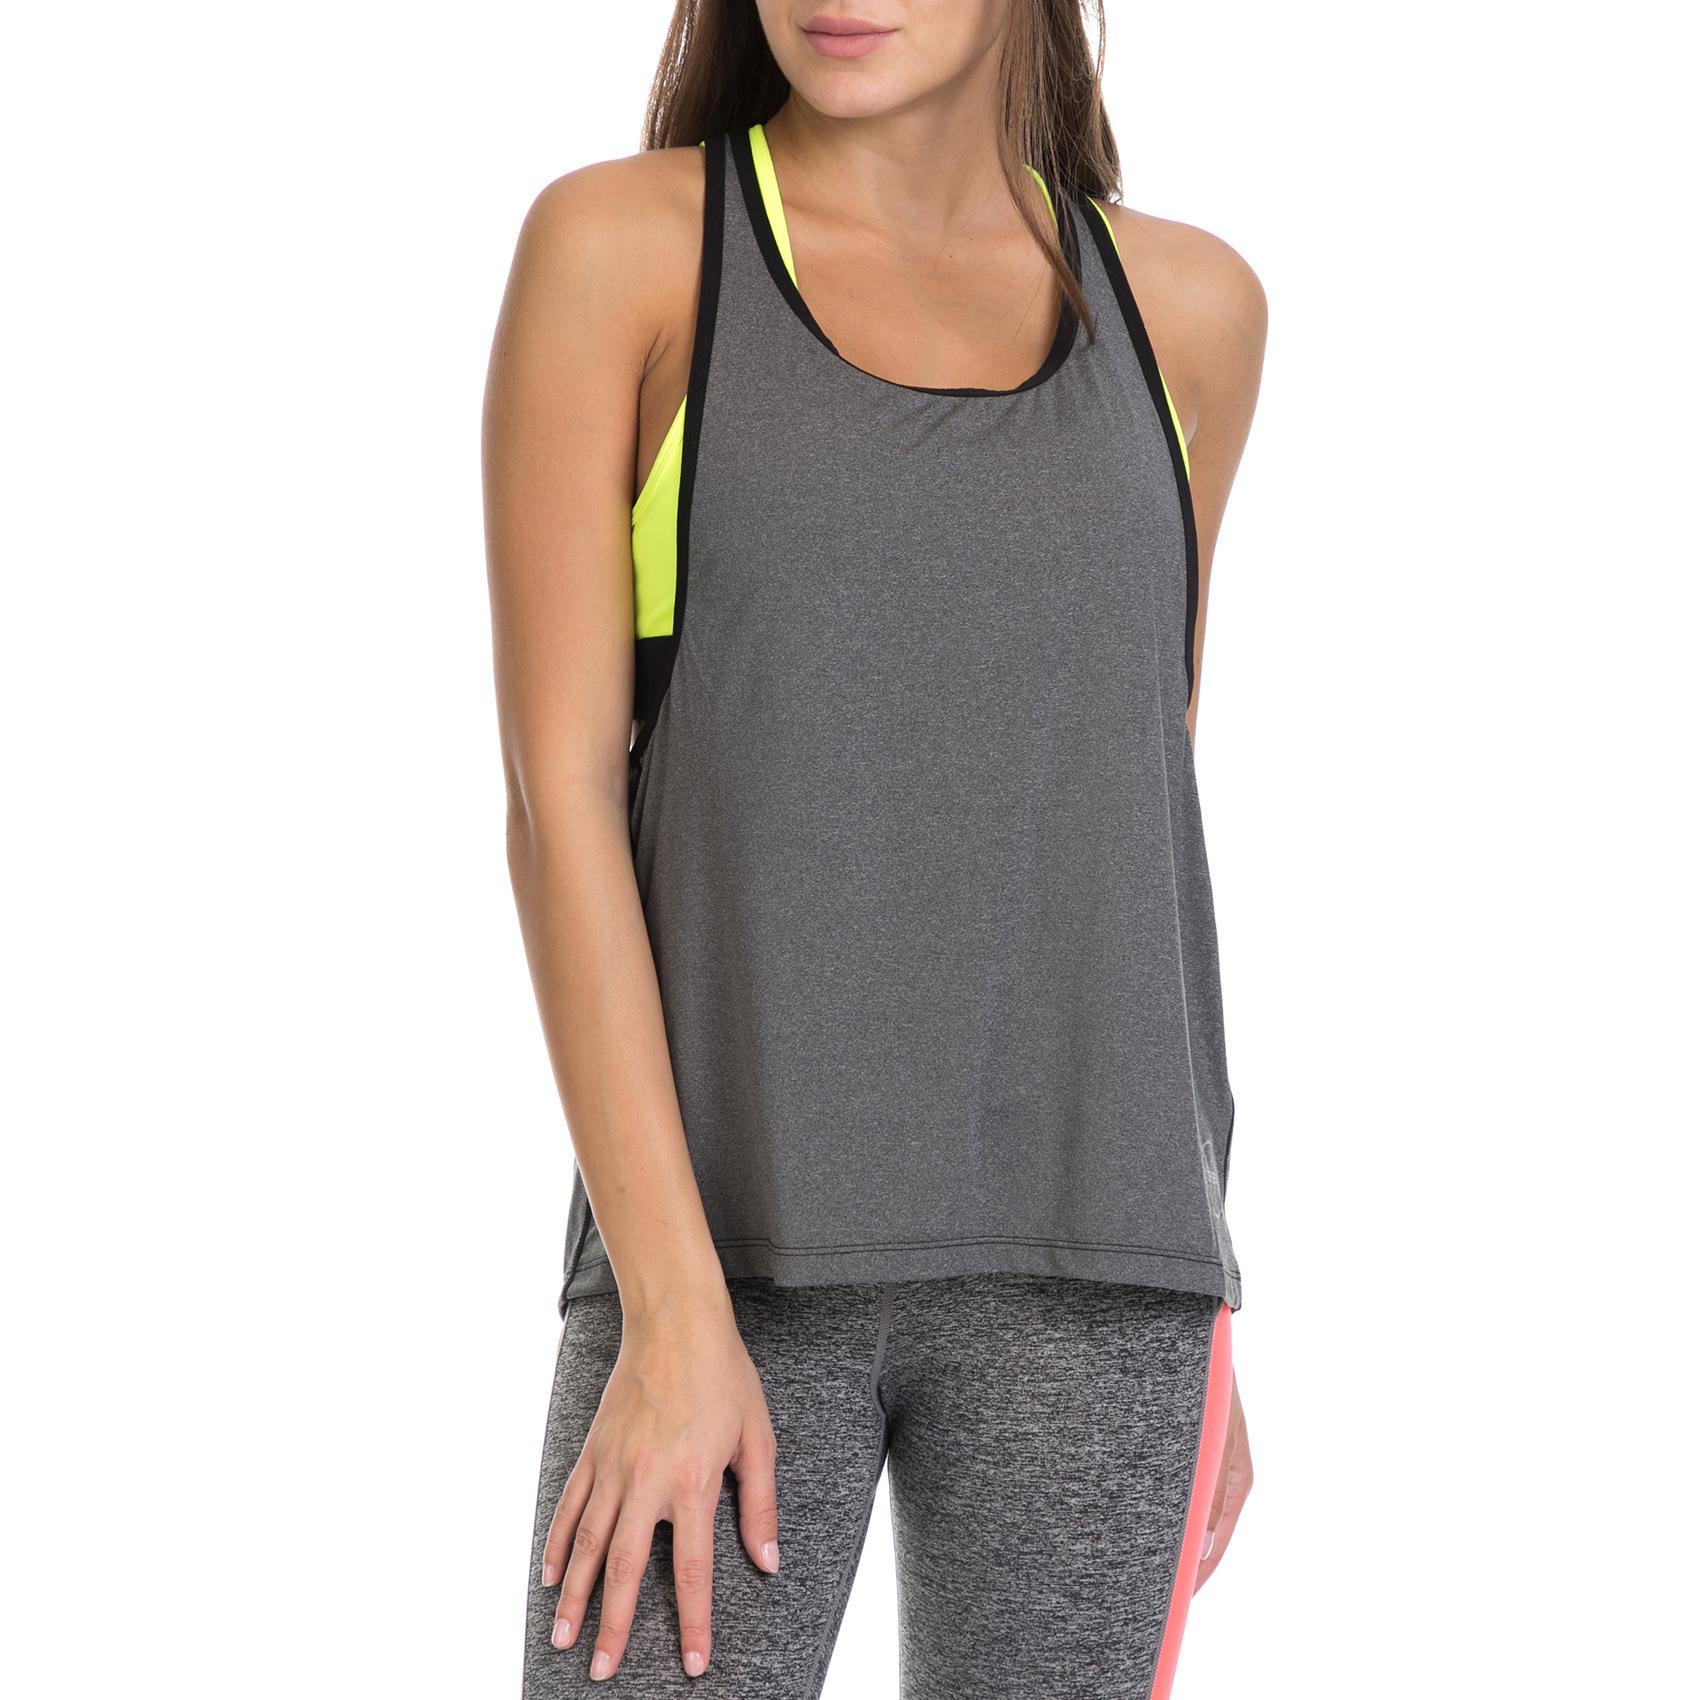 GSA - Γυναικεία αθλητική μπλούζα GSA DOUBLE LOOSE TANK TOP T-SHIRT γκρι-κίτρινη γυναικεία ρούχα μπλούζες αμάνικες